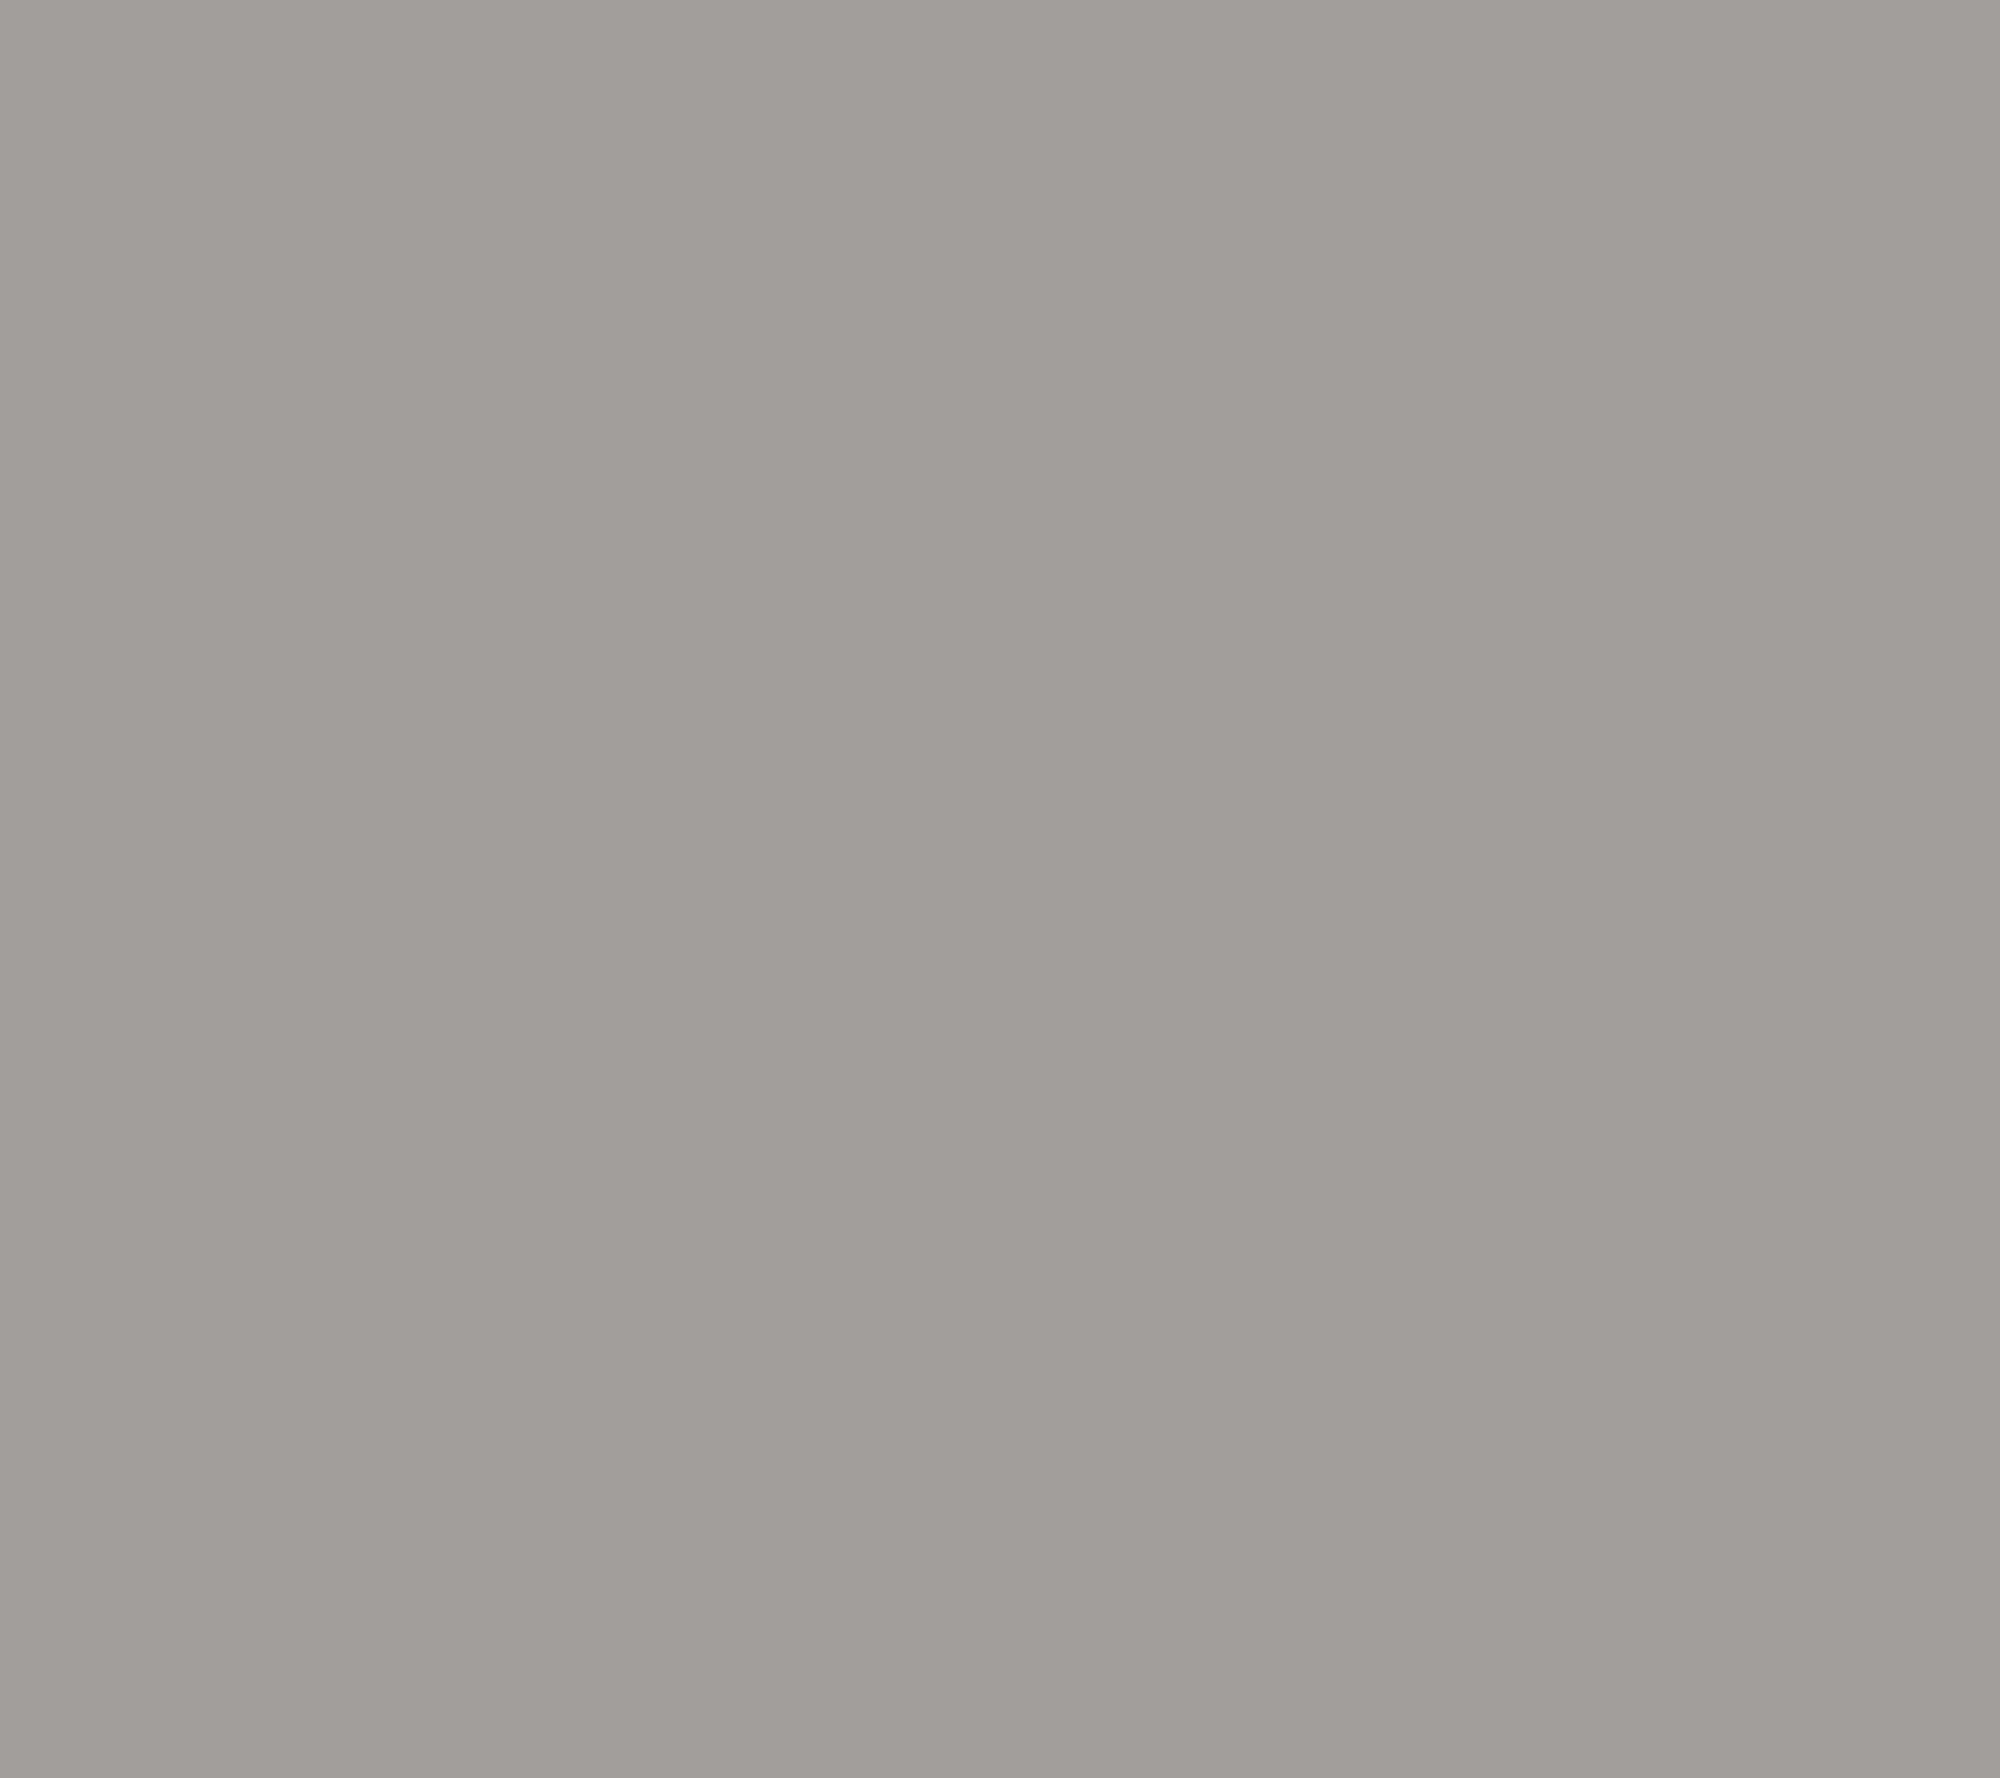 7472996b2be PUMA Hightop Sneakers - Vikky Mid Corduroy - Page 1 — QVC.com